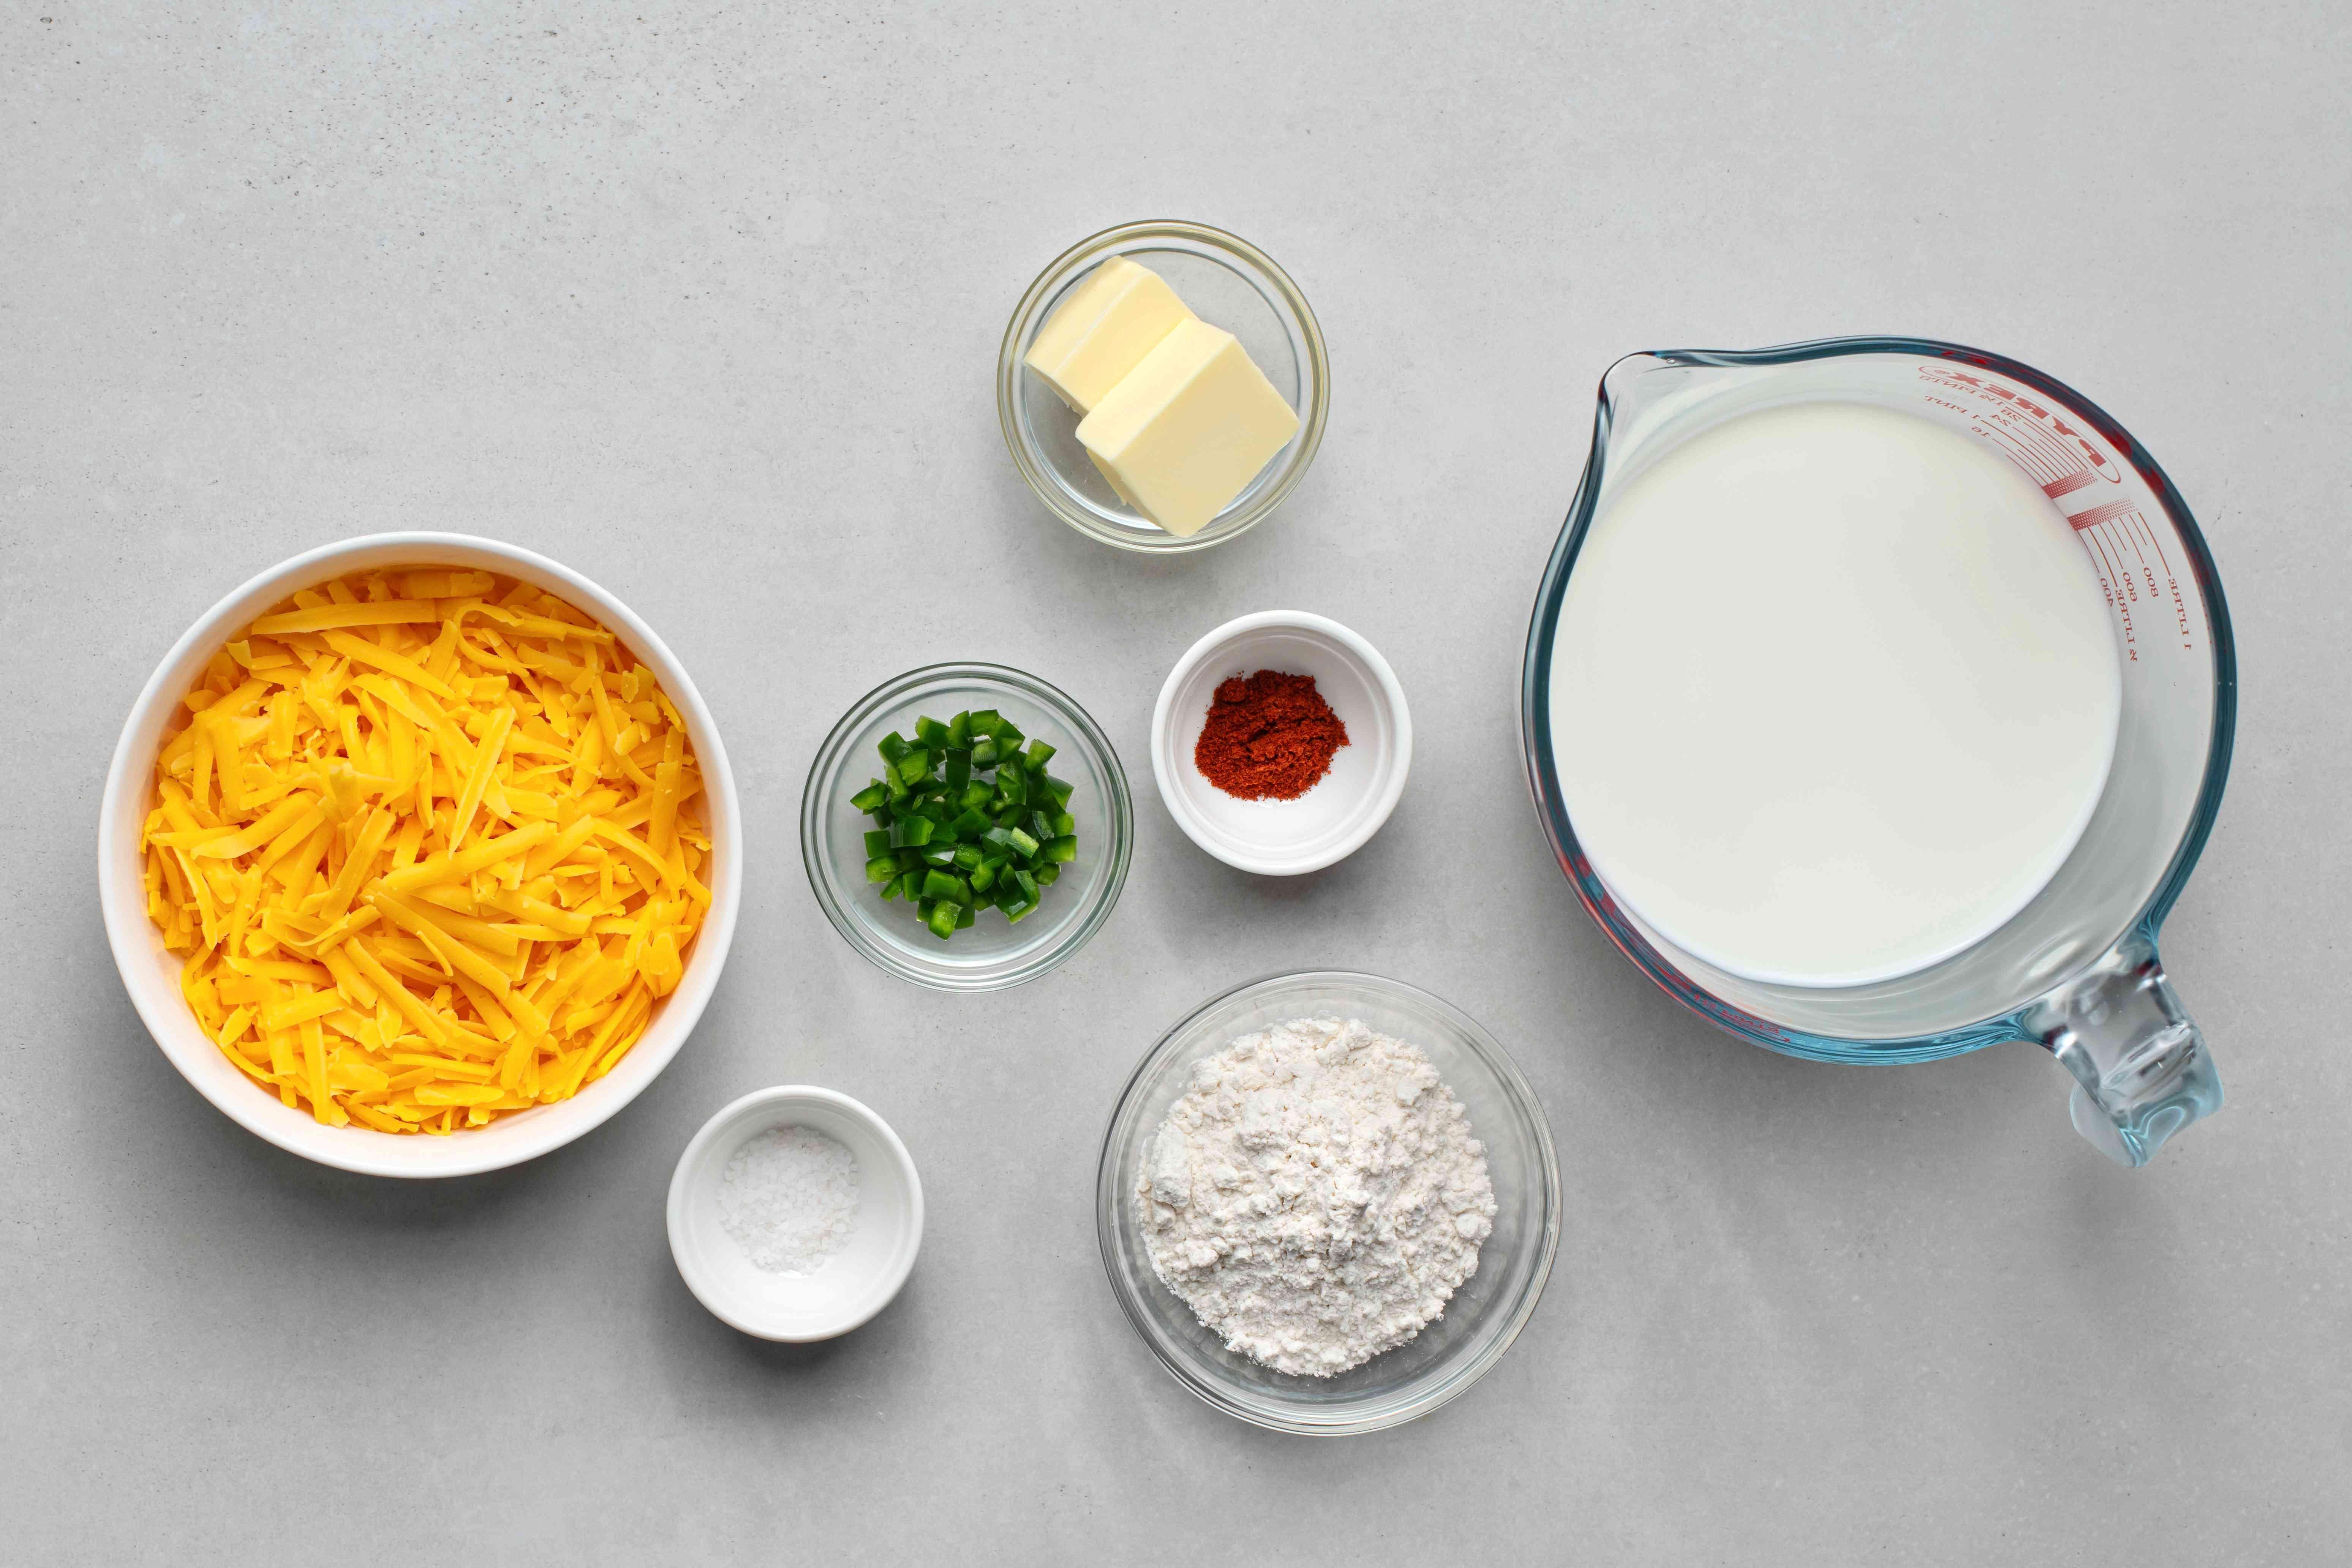 Salsa De Queso Cheese Sauce ingredients